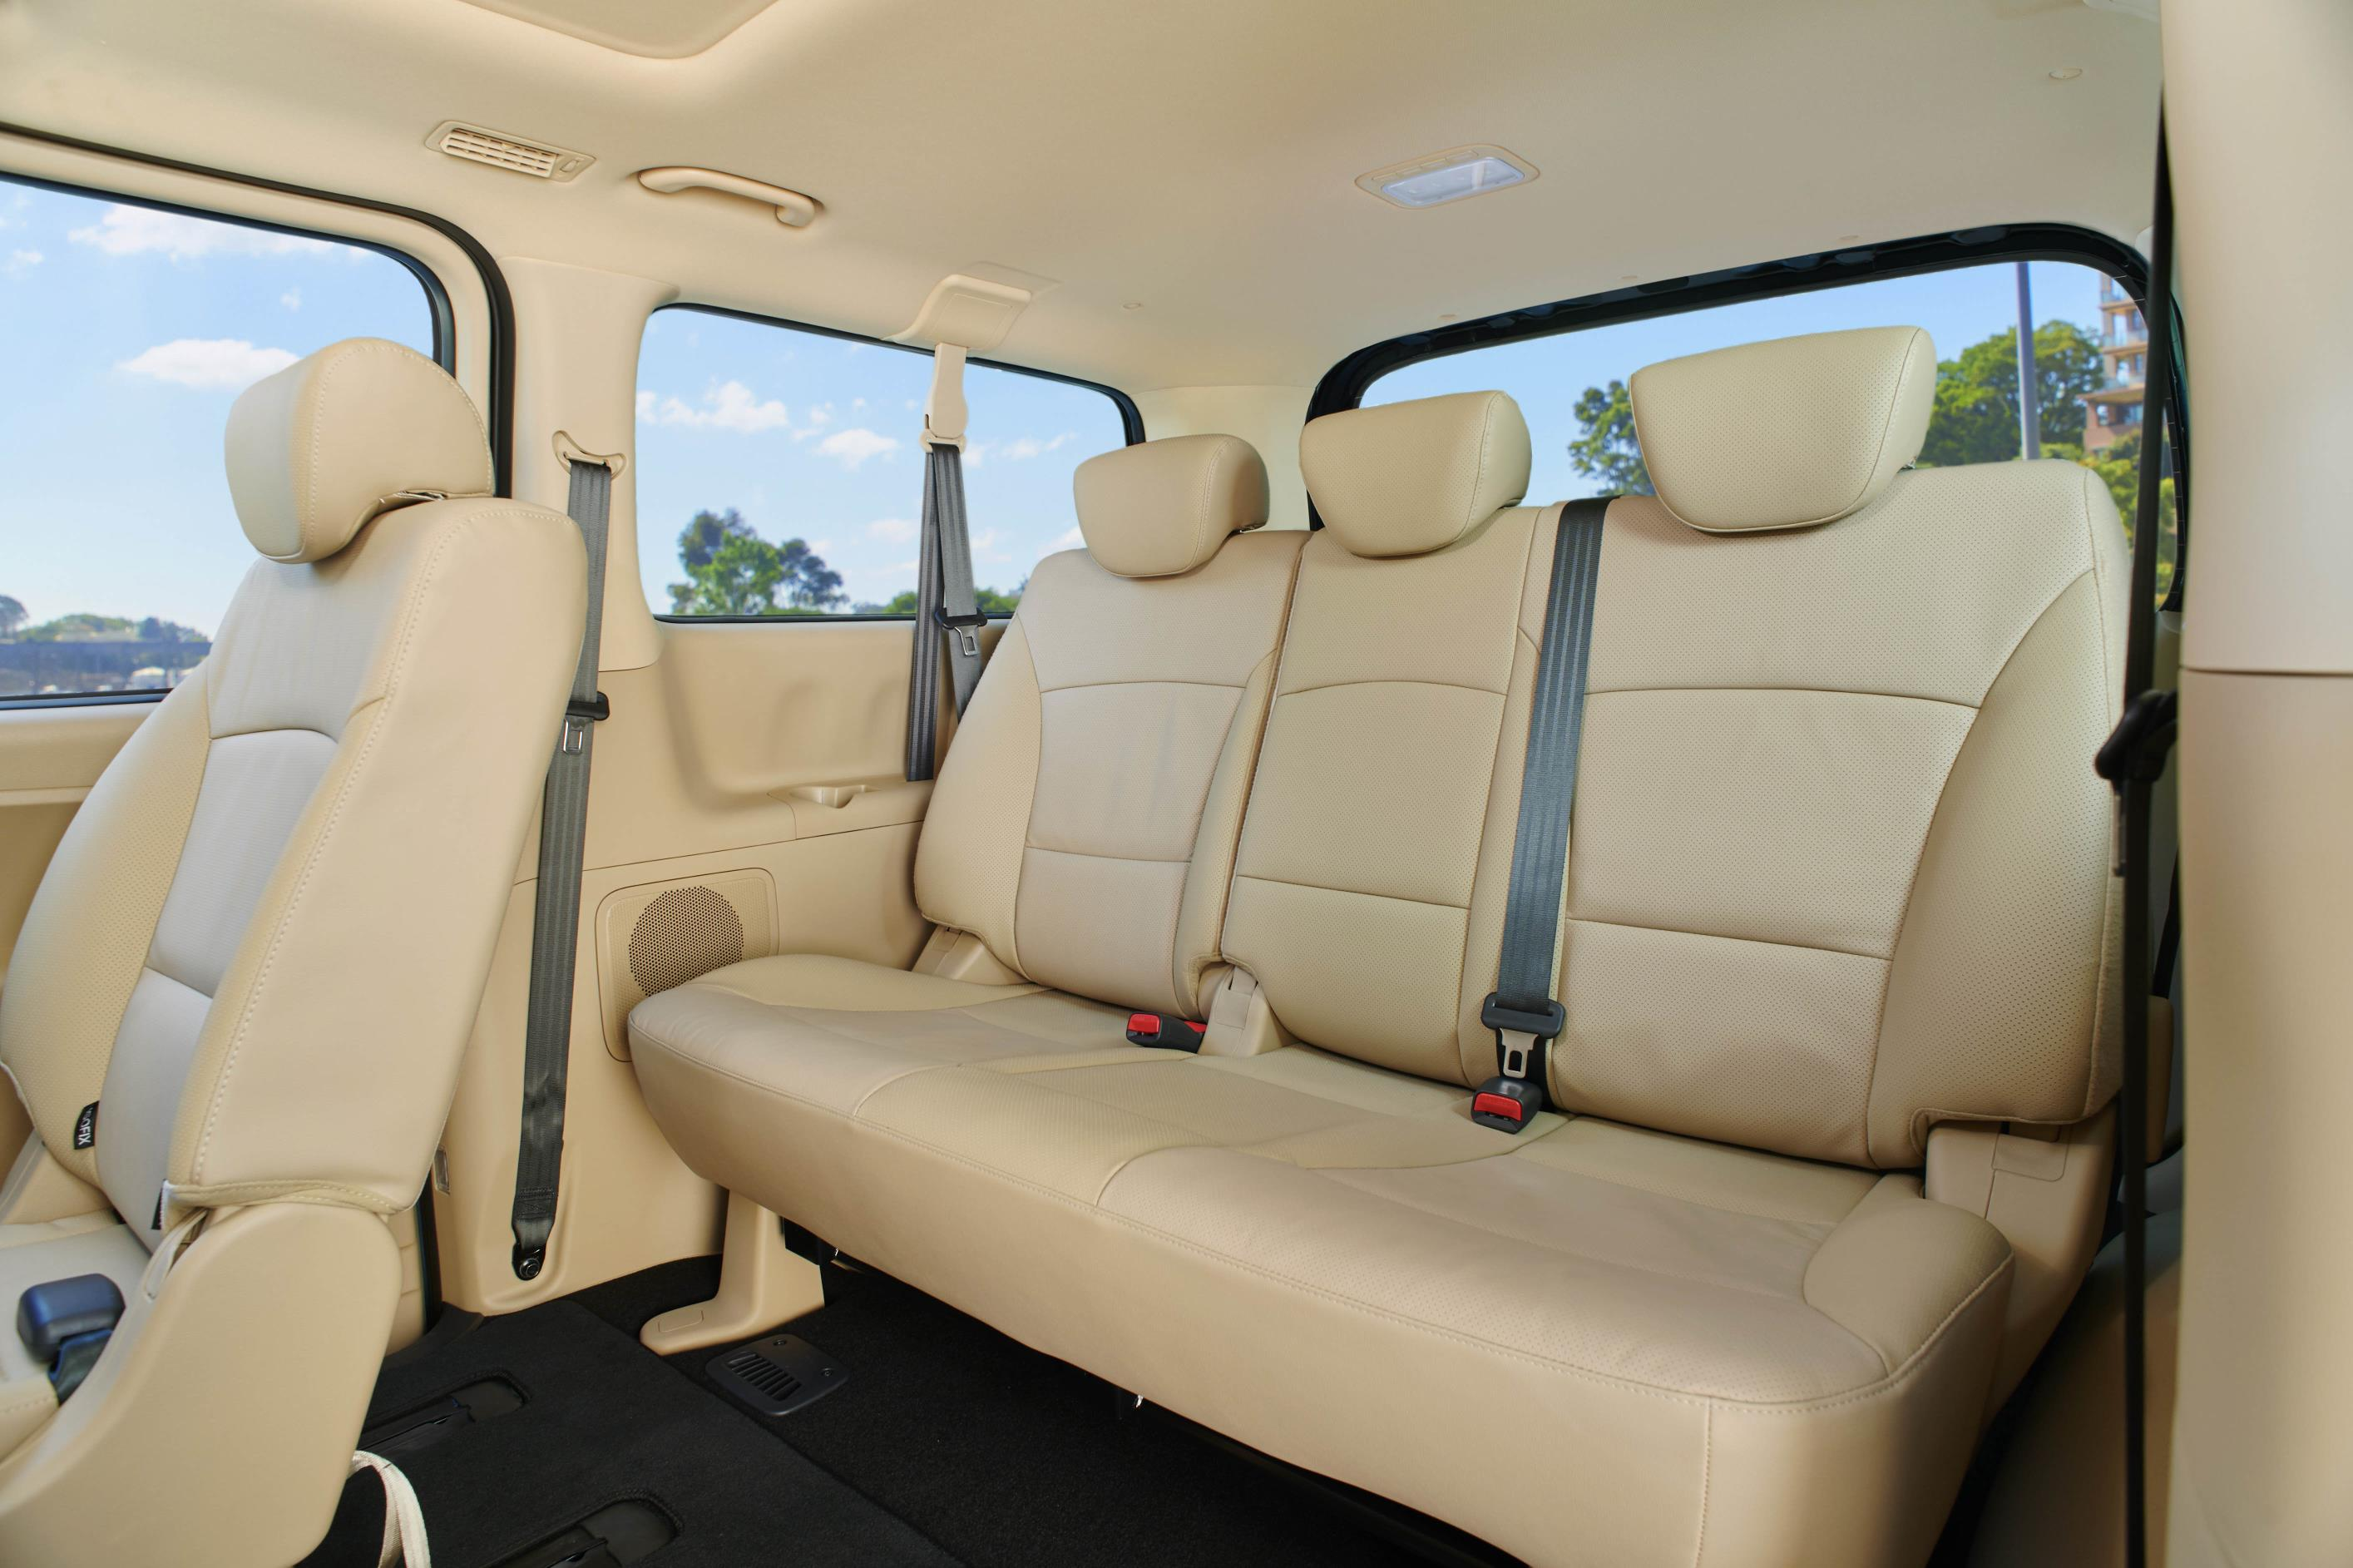 2019 Hyundai Iload  U0026 Imax Get Smart New Look  Now On Sale